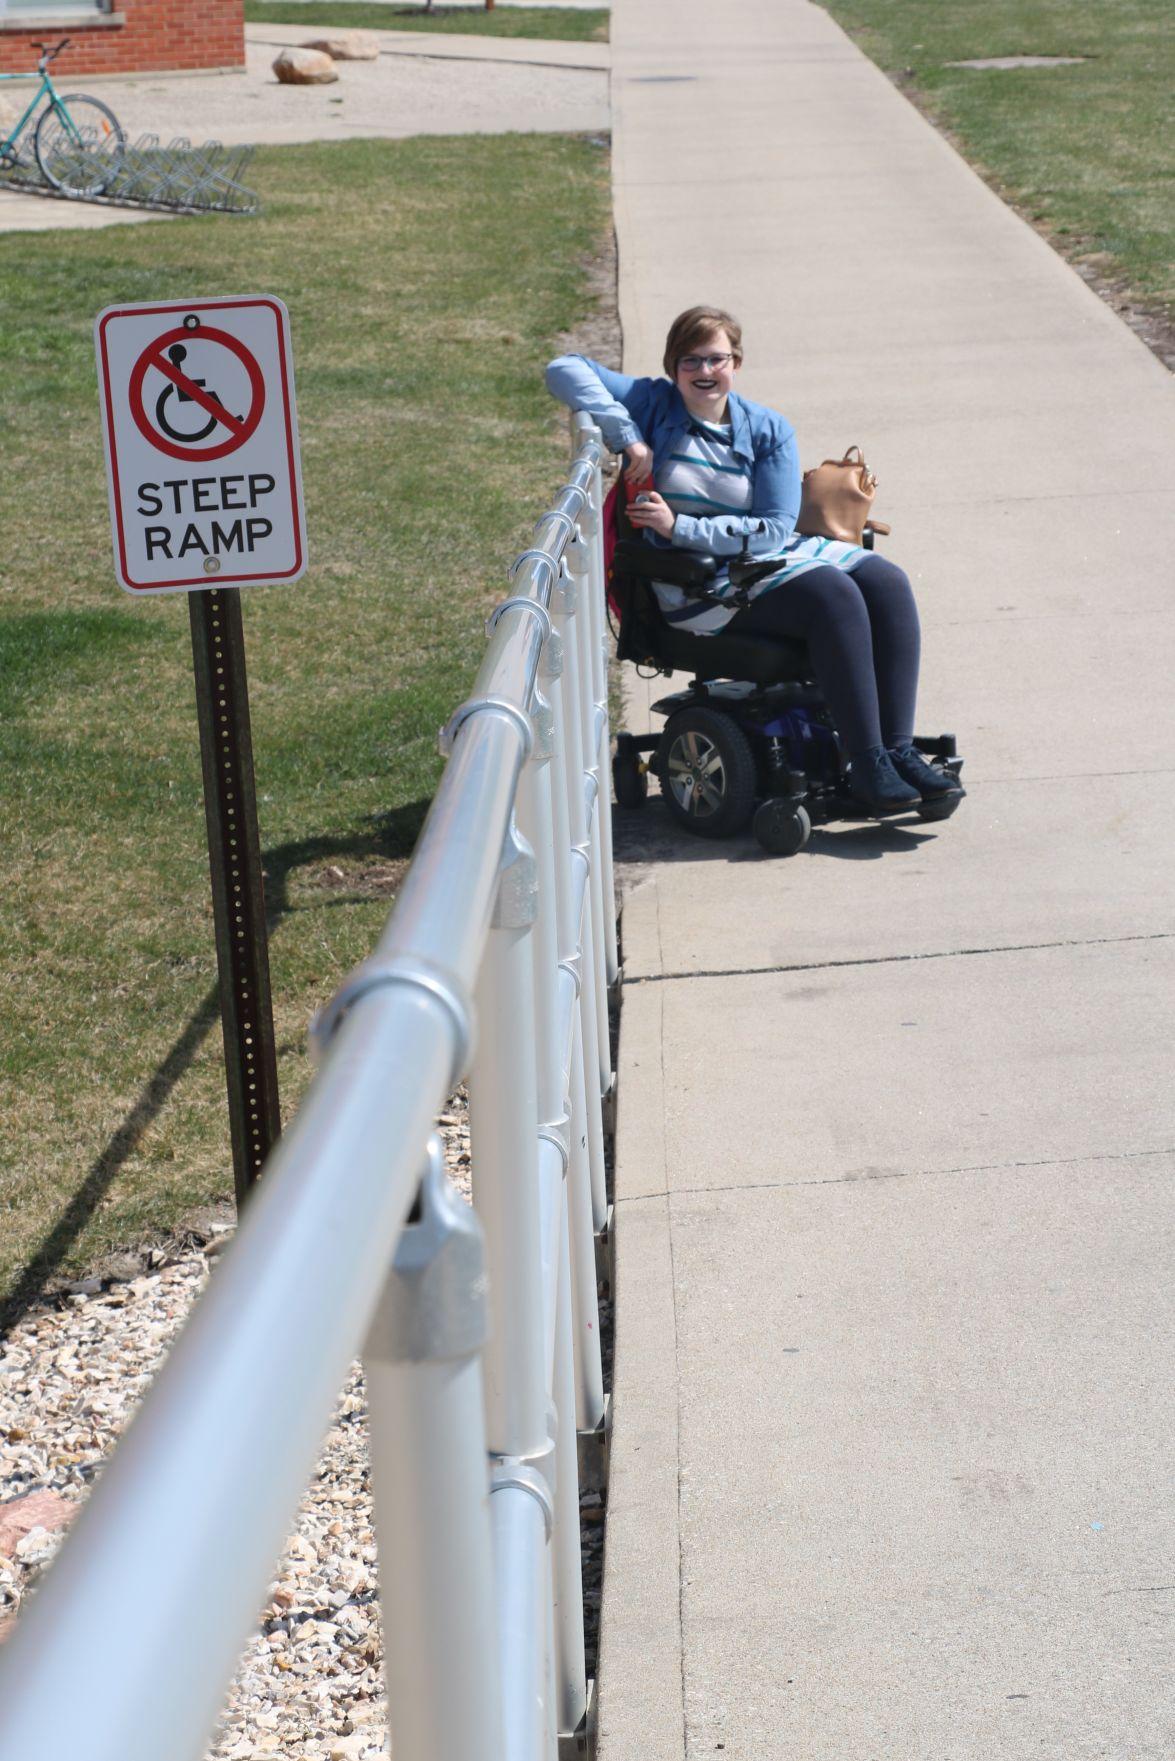 Campus inaccessibility